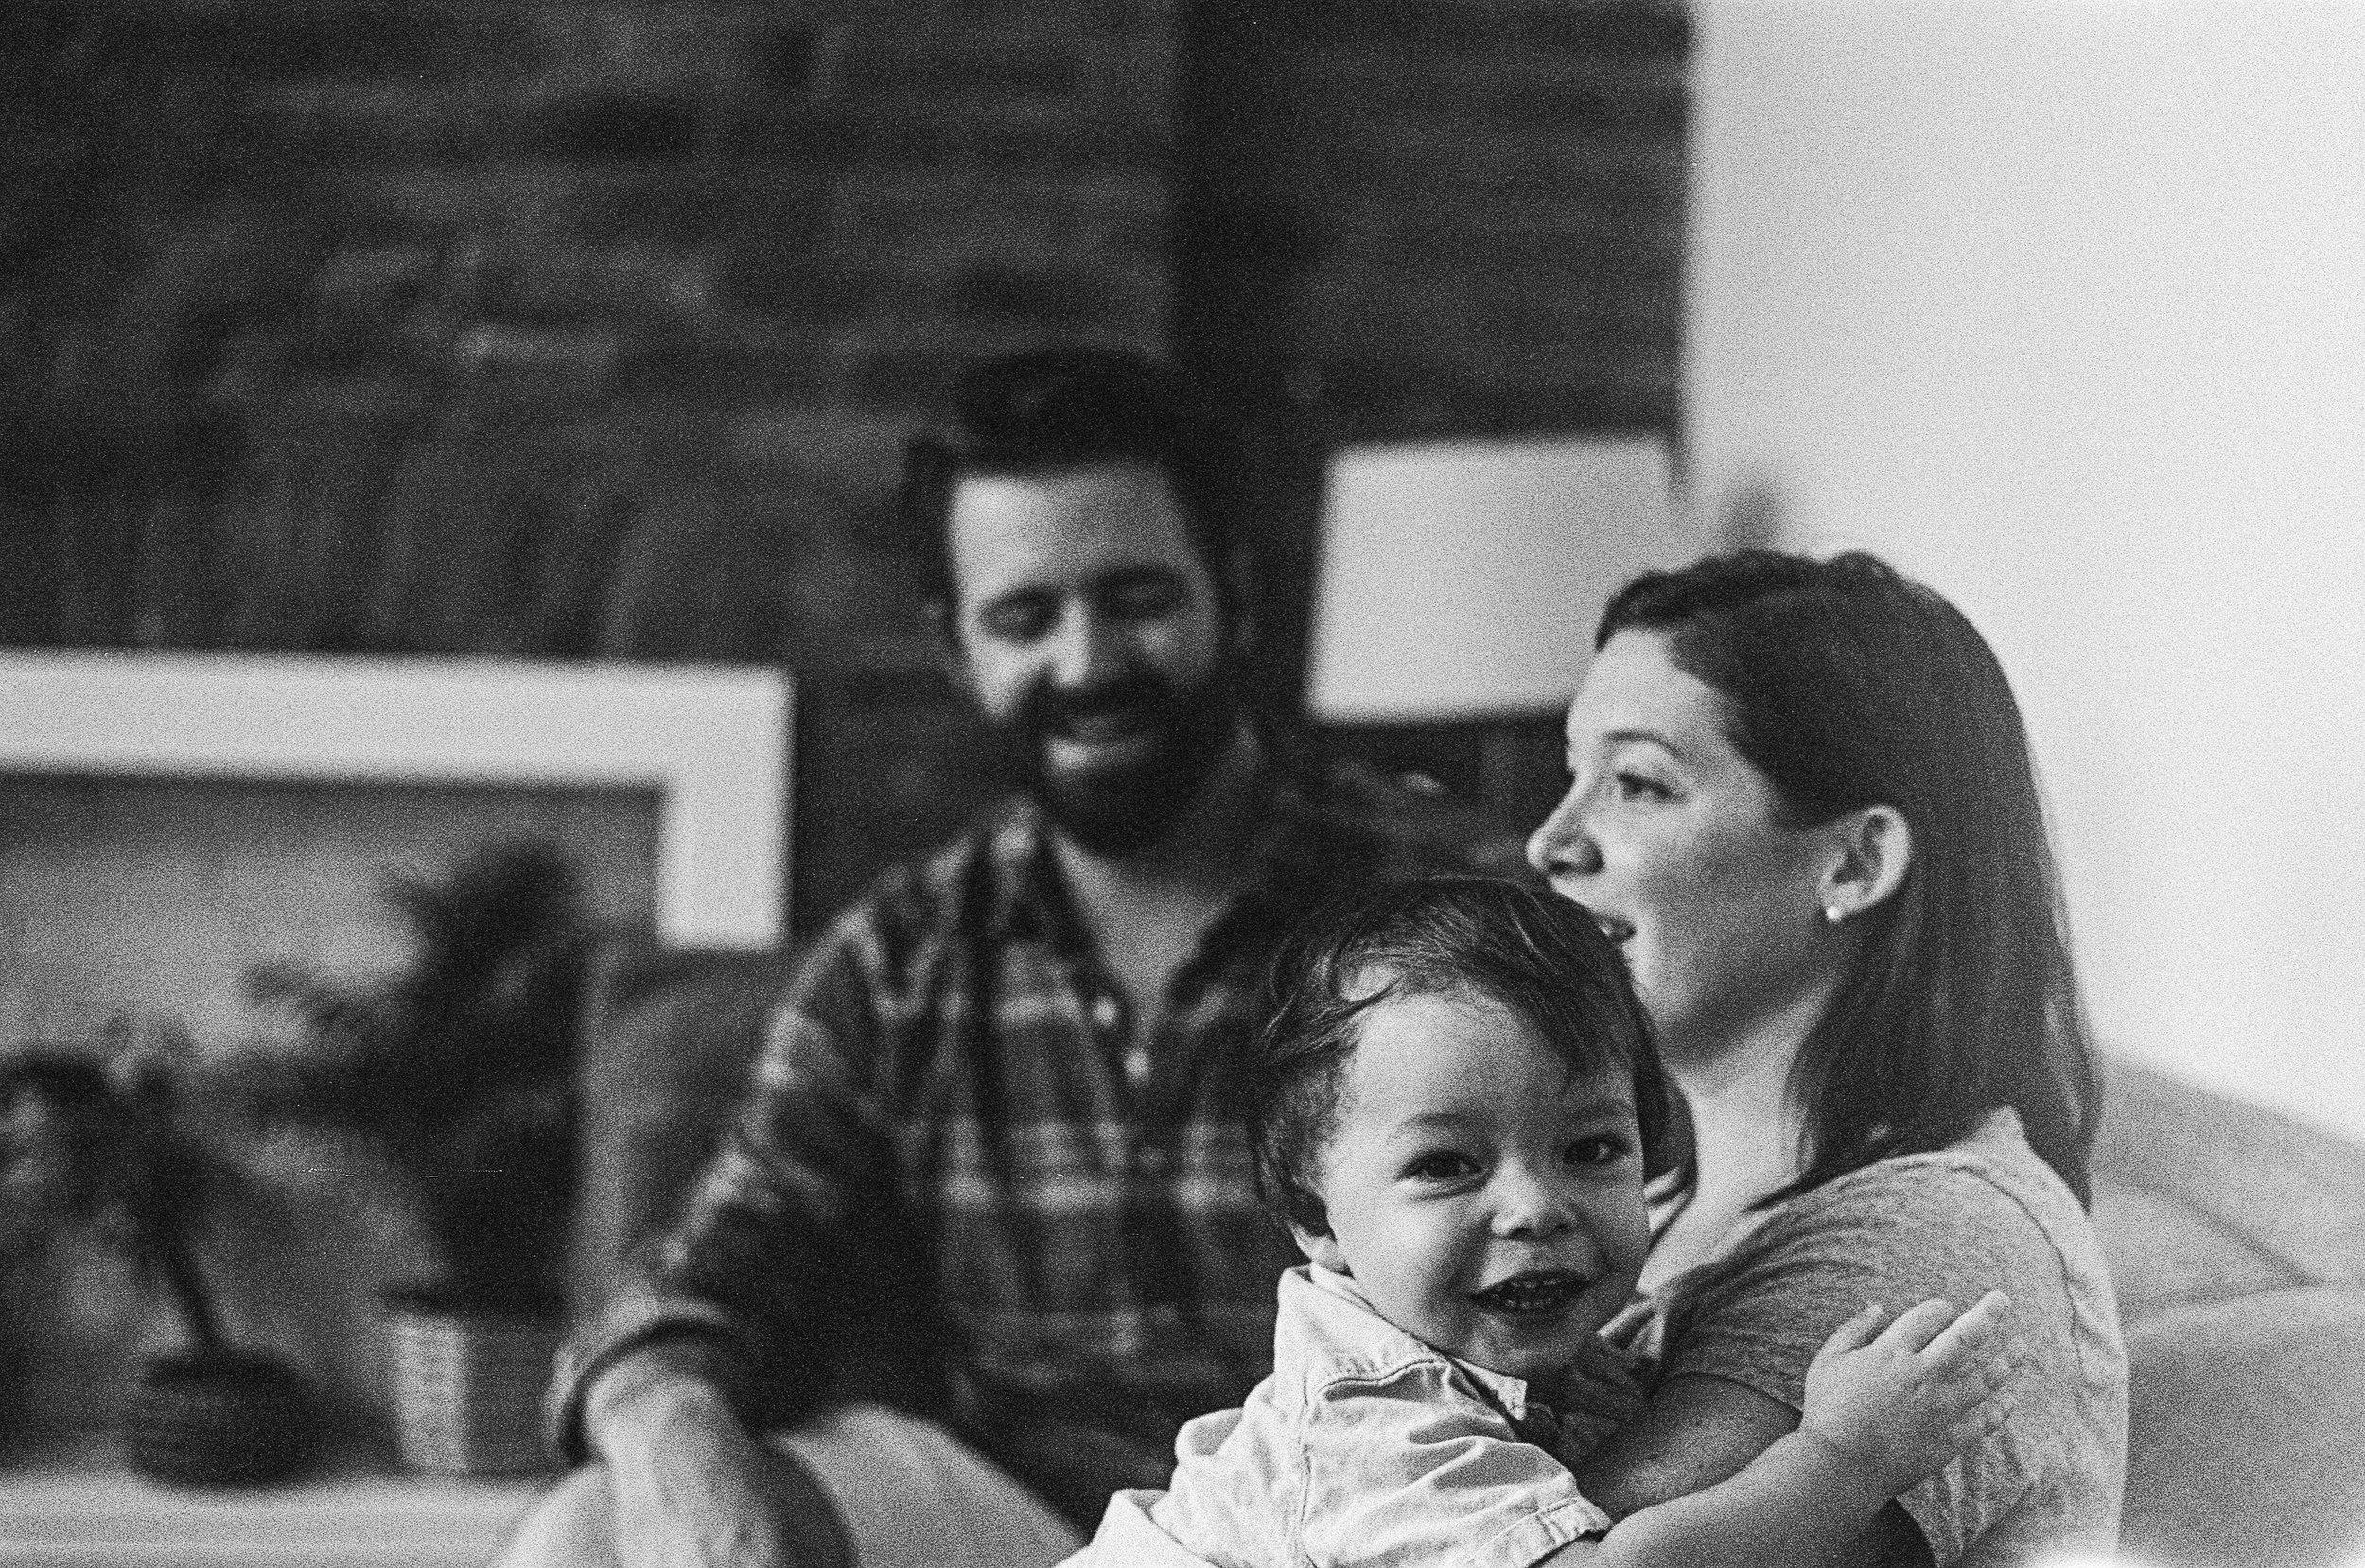 family_portraits_35mm